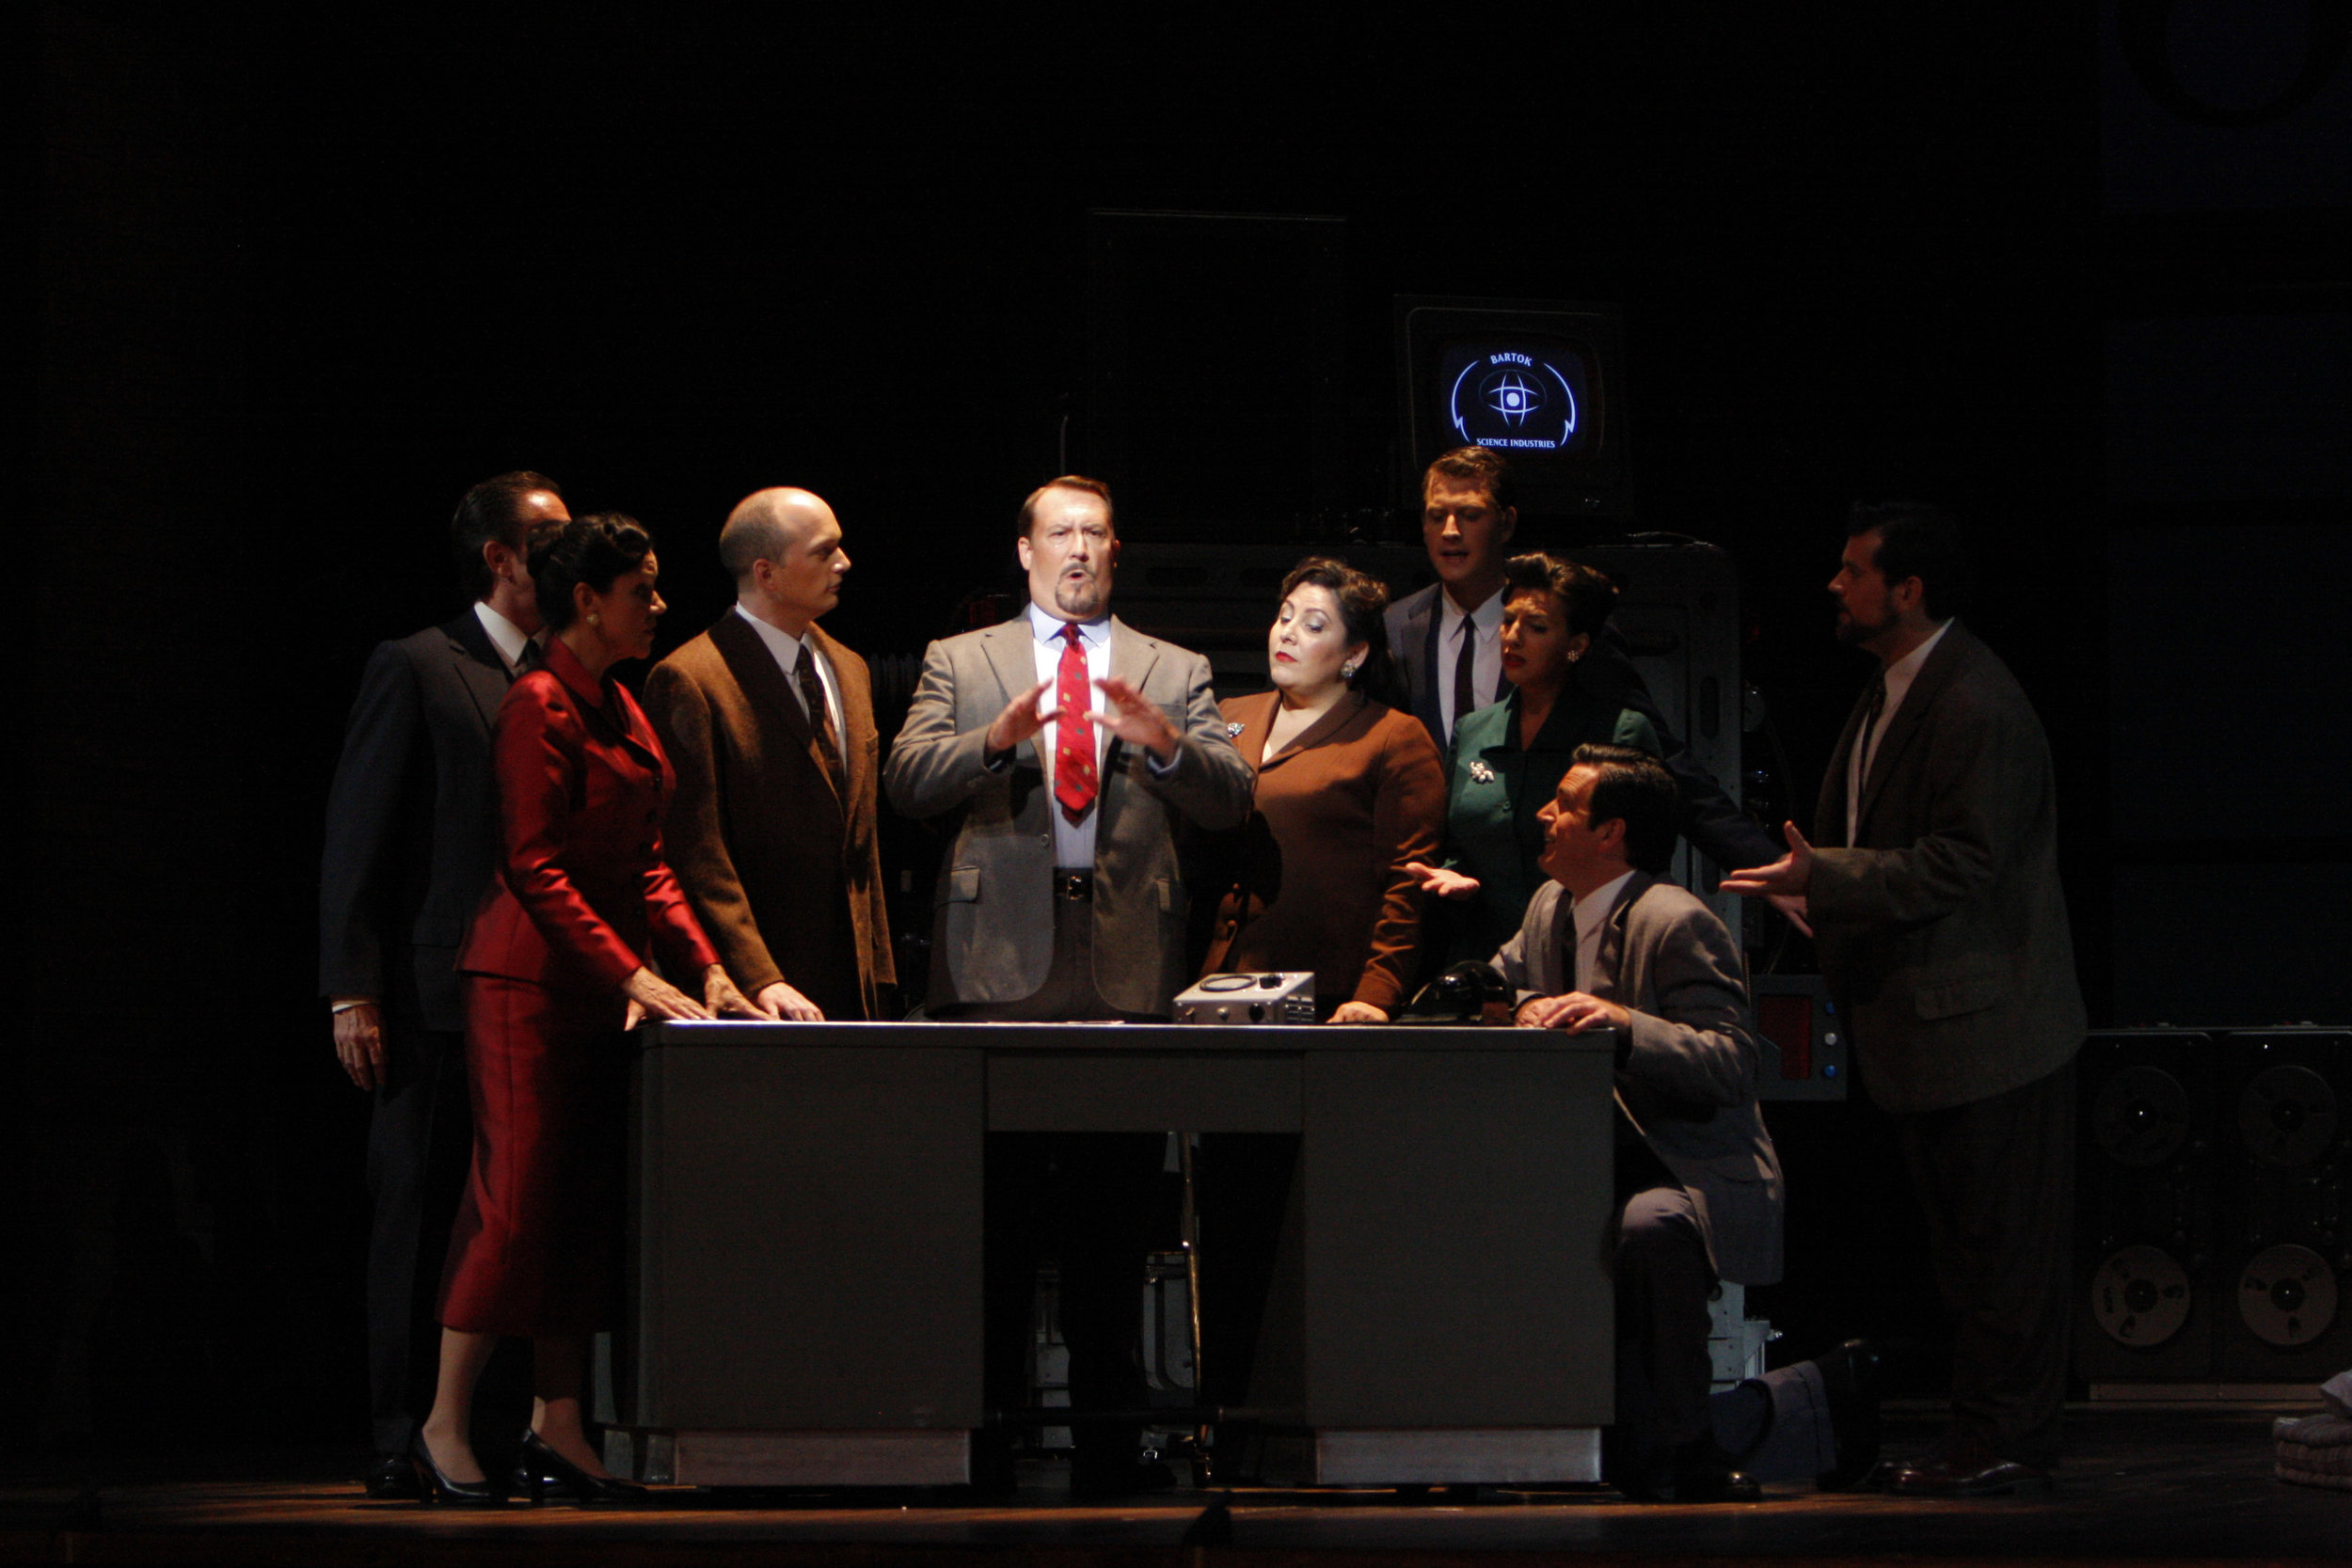 Gary Lehman (center) as Stathis Borans in The Fly. 图片来源: Robert Millard, 美国洛杉矶歌剧院, 2008